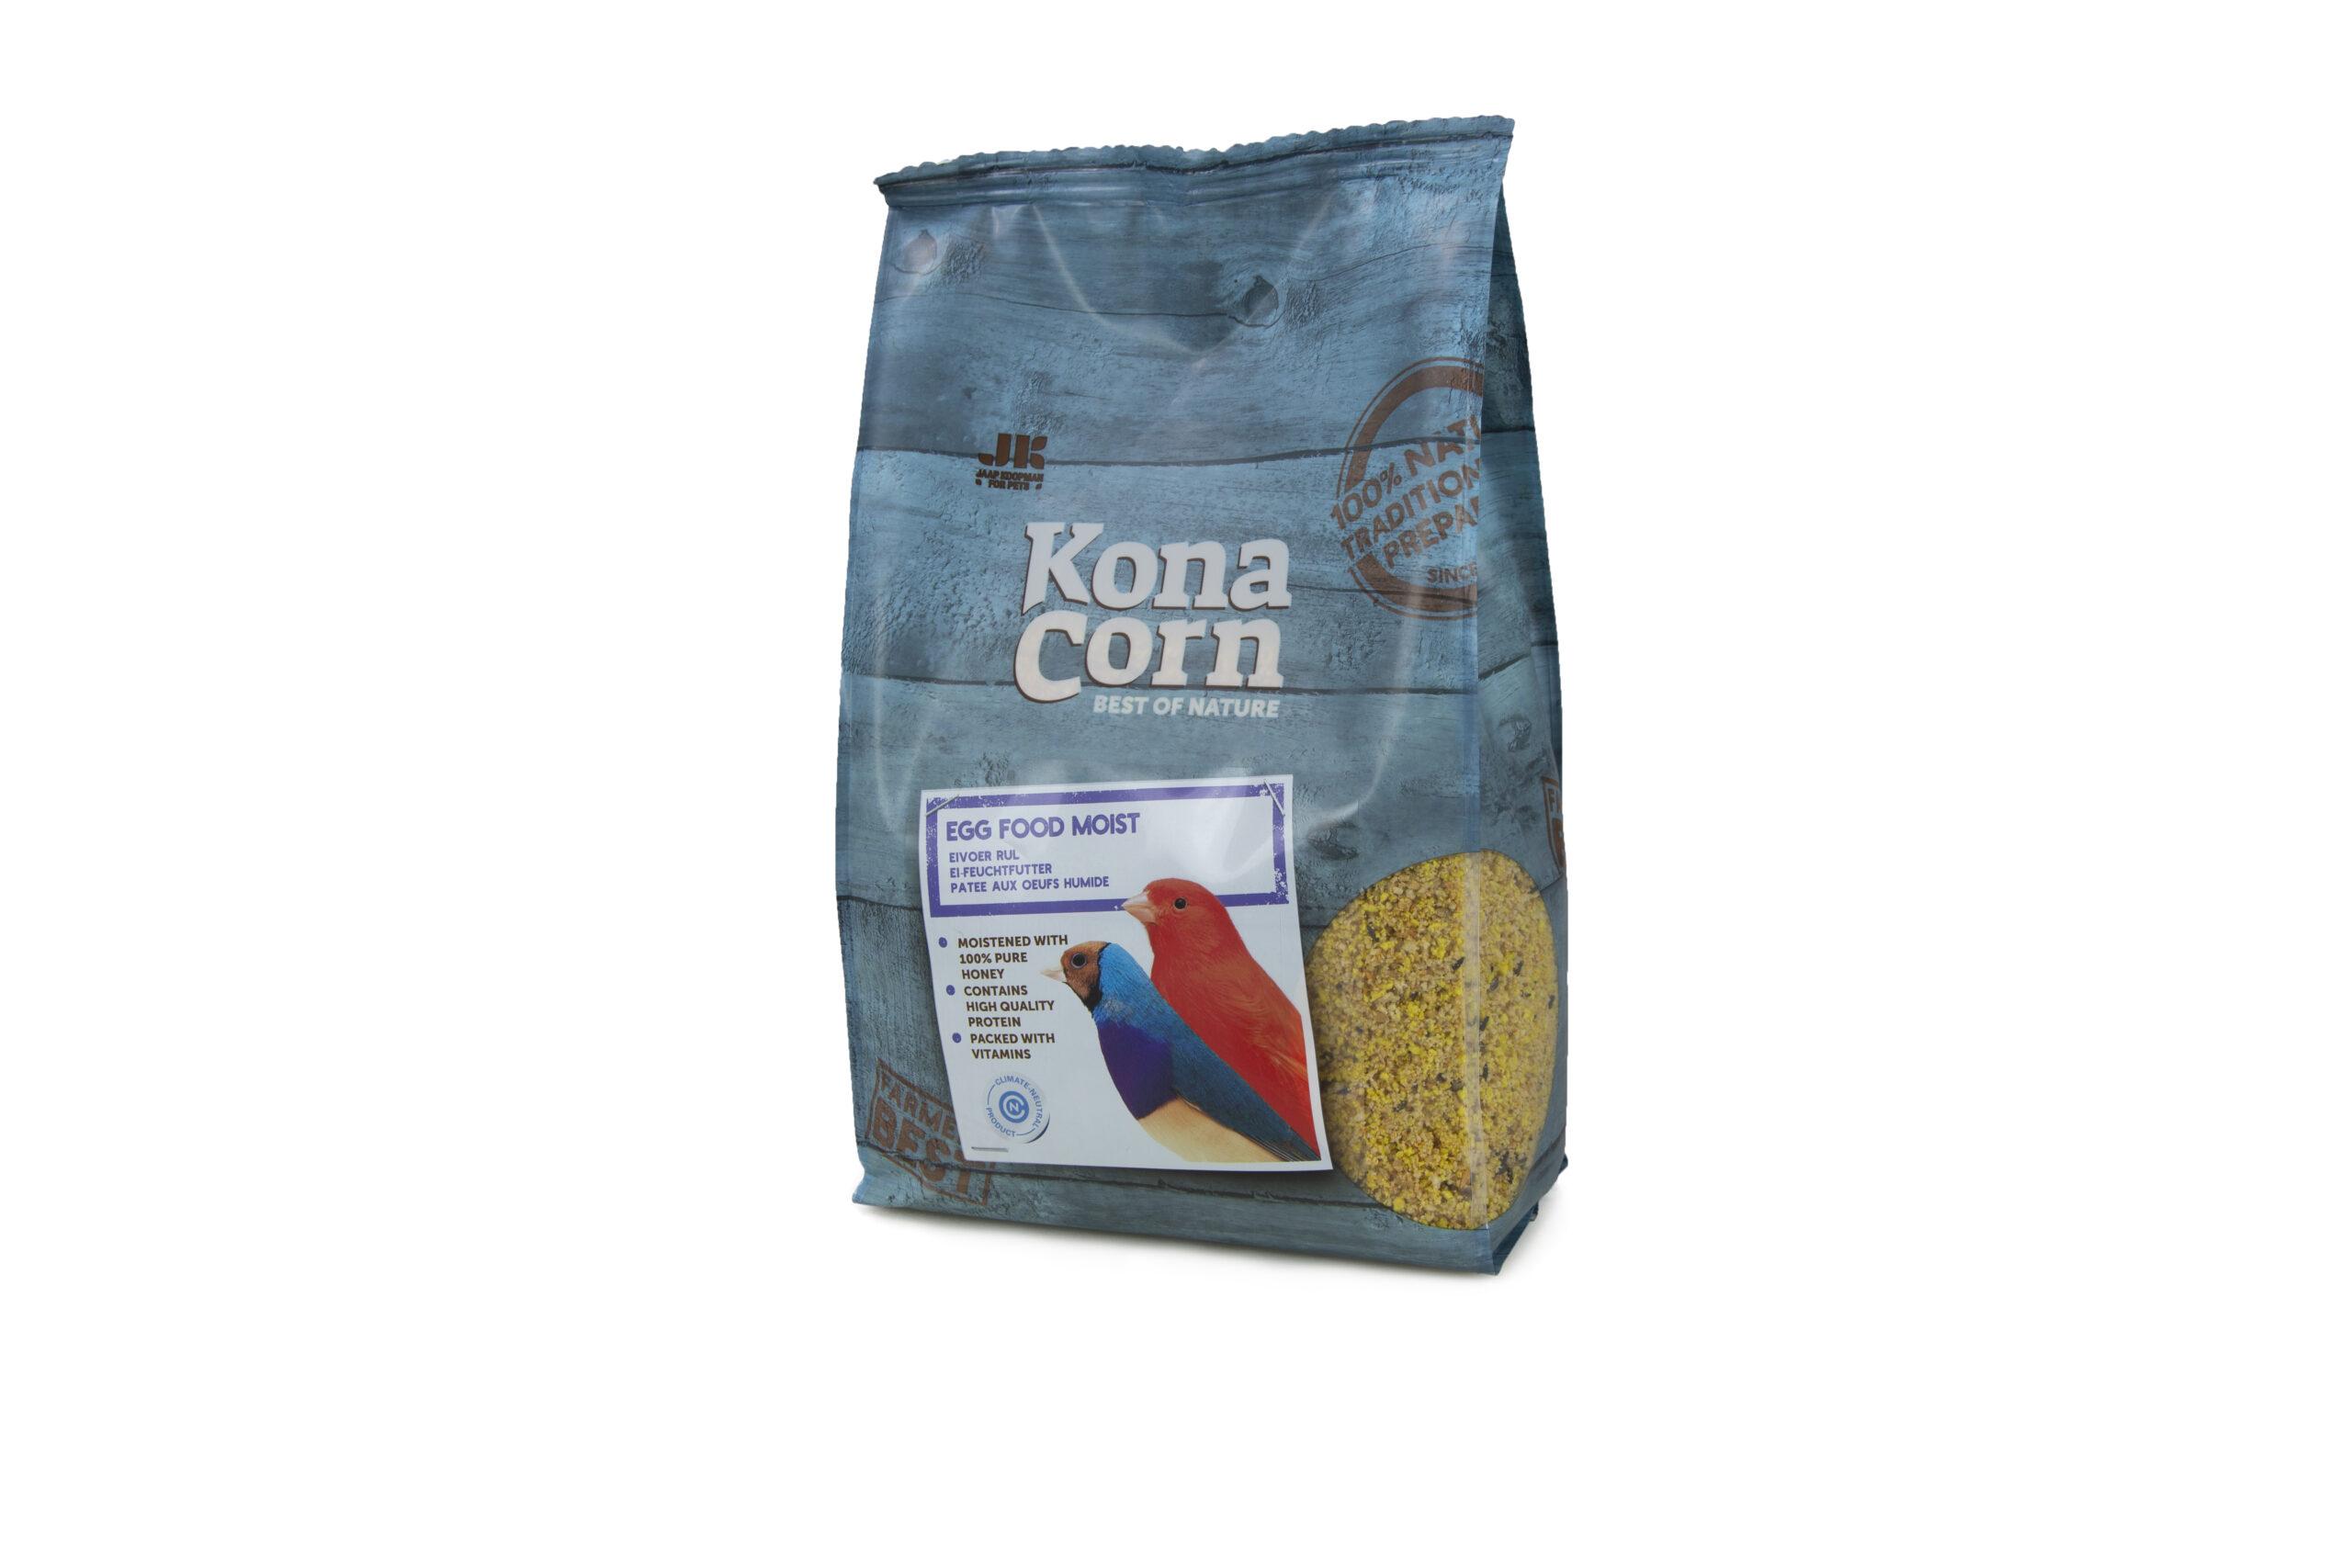 Kona Corn Eivoer Rul